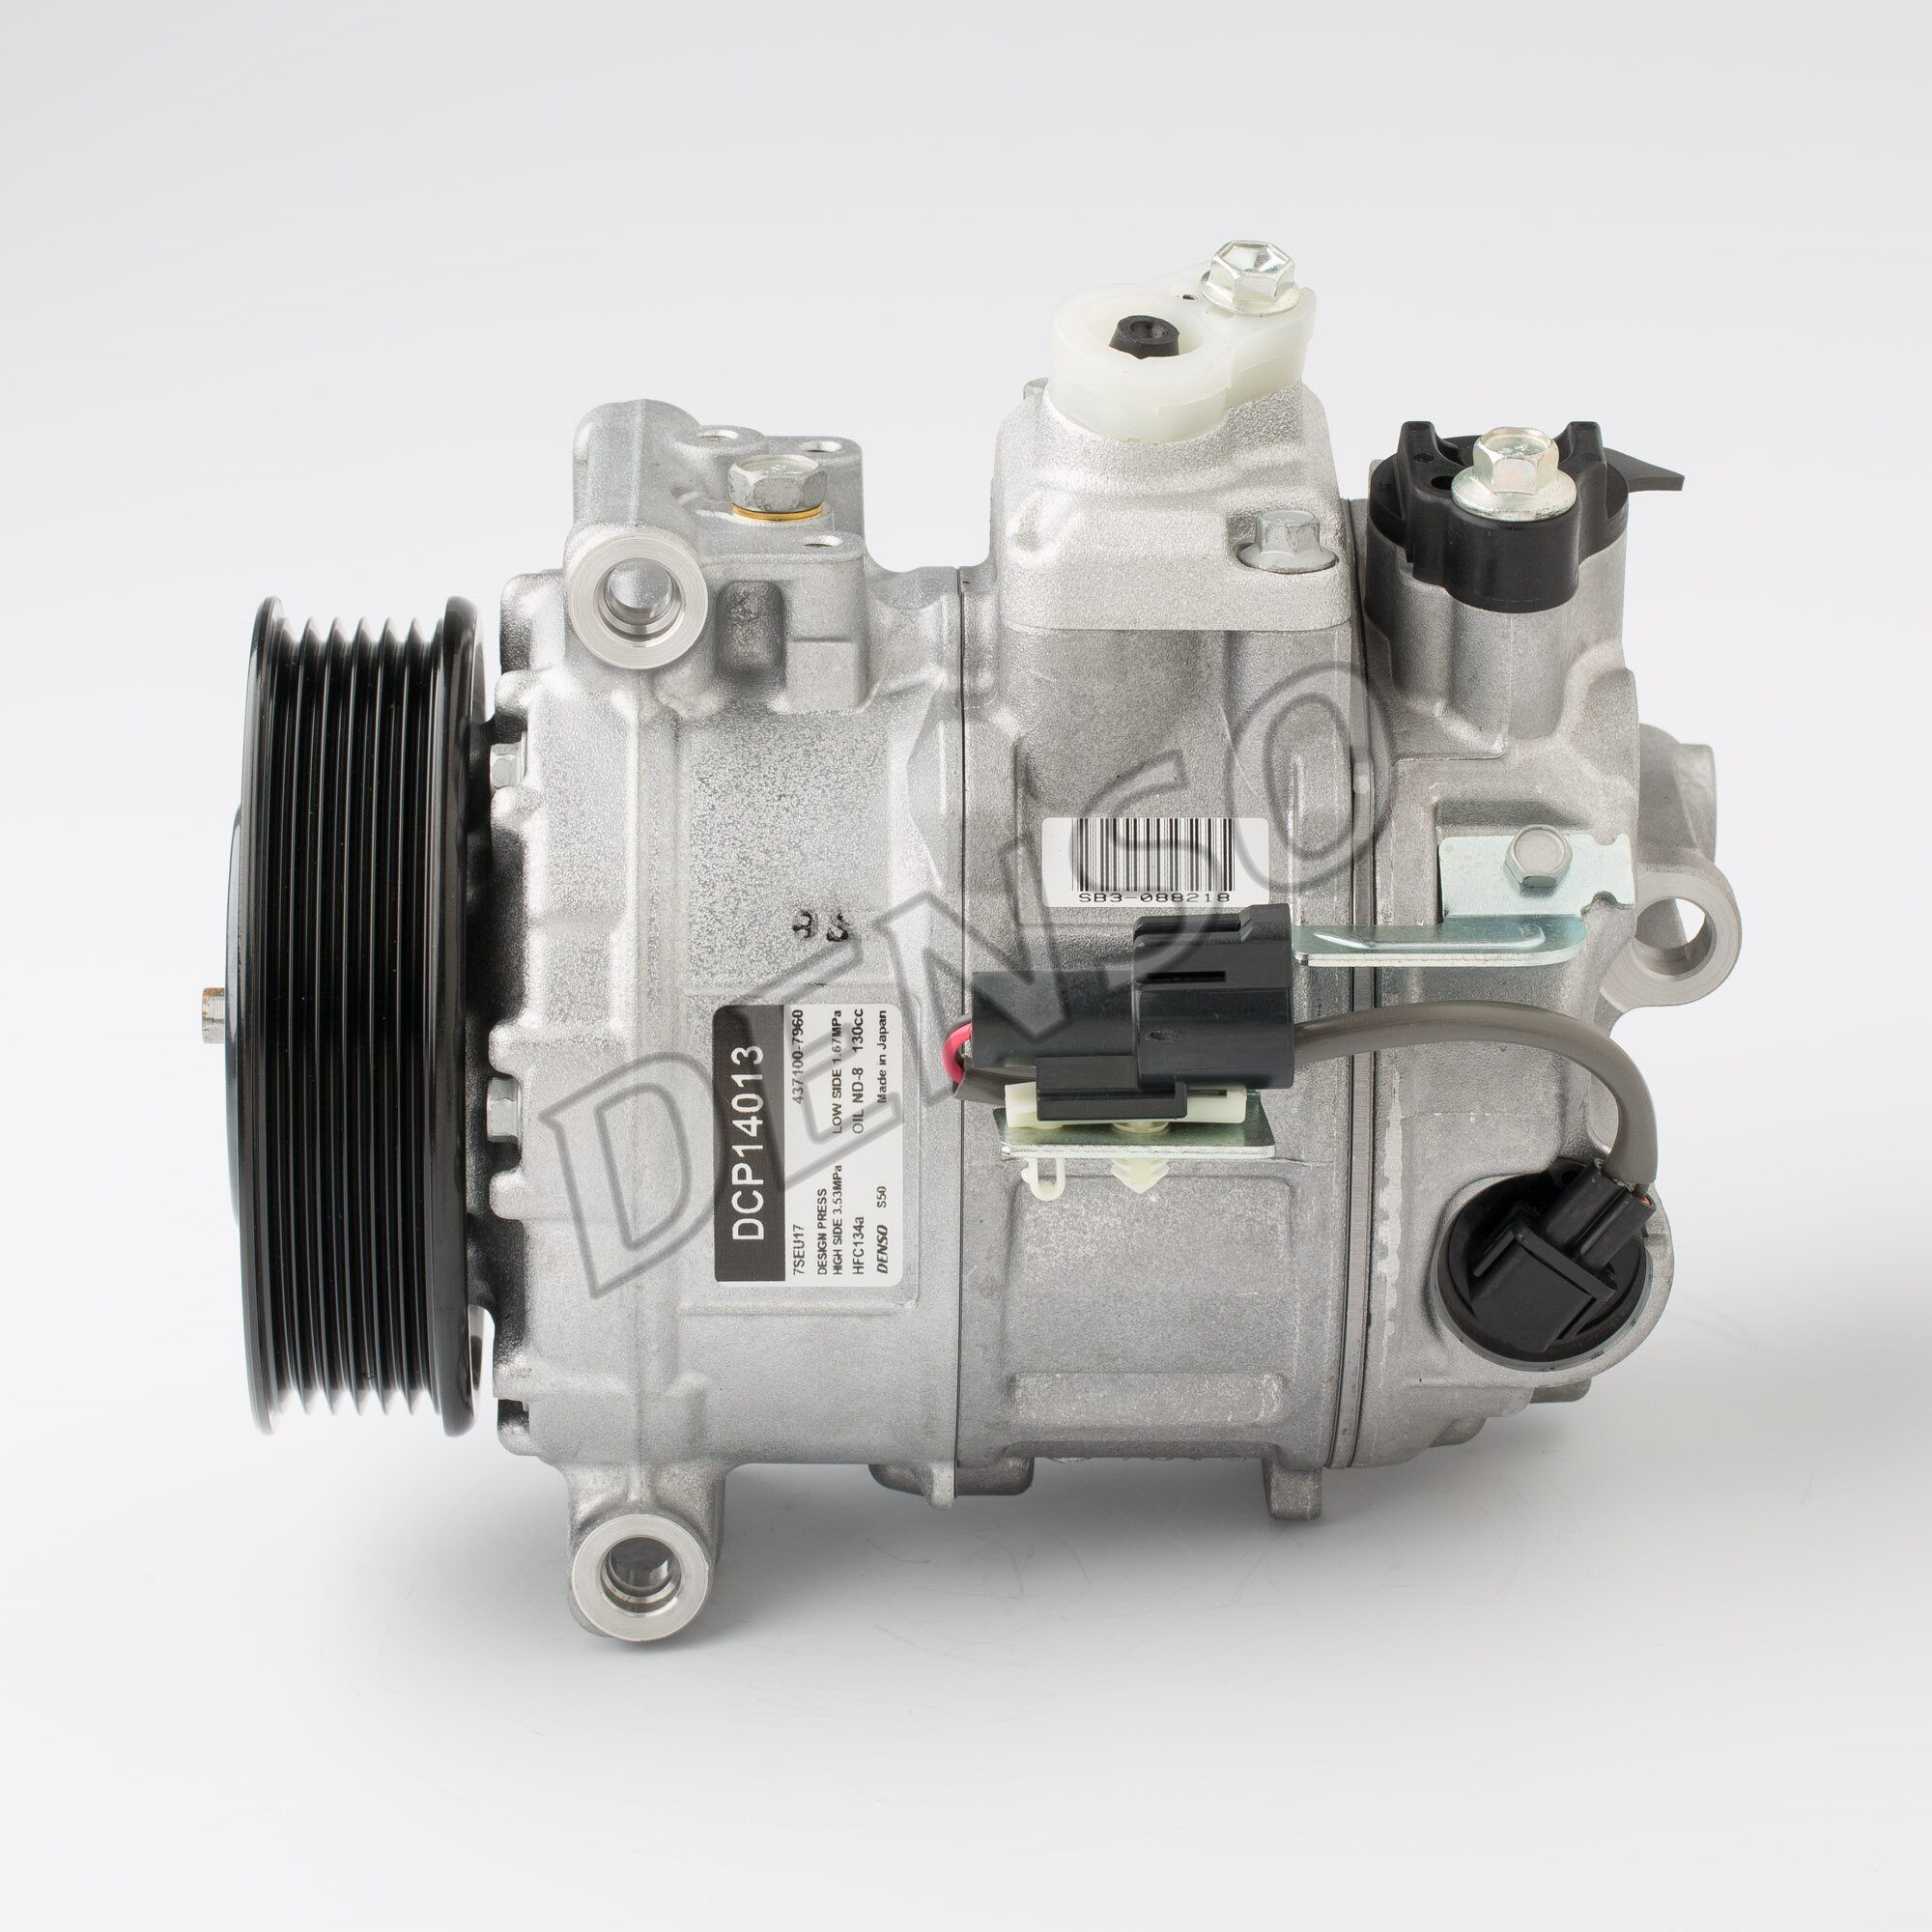 DCP14013 Klimaanlage Kompressor DENSO - Markenprodukte billig